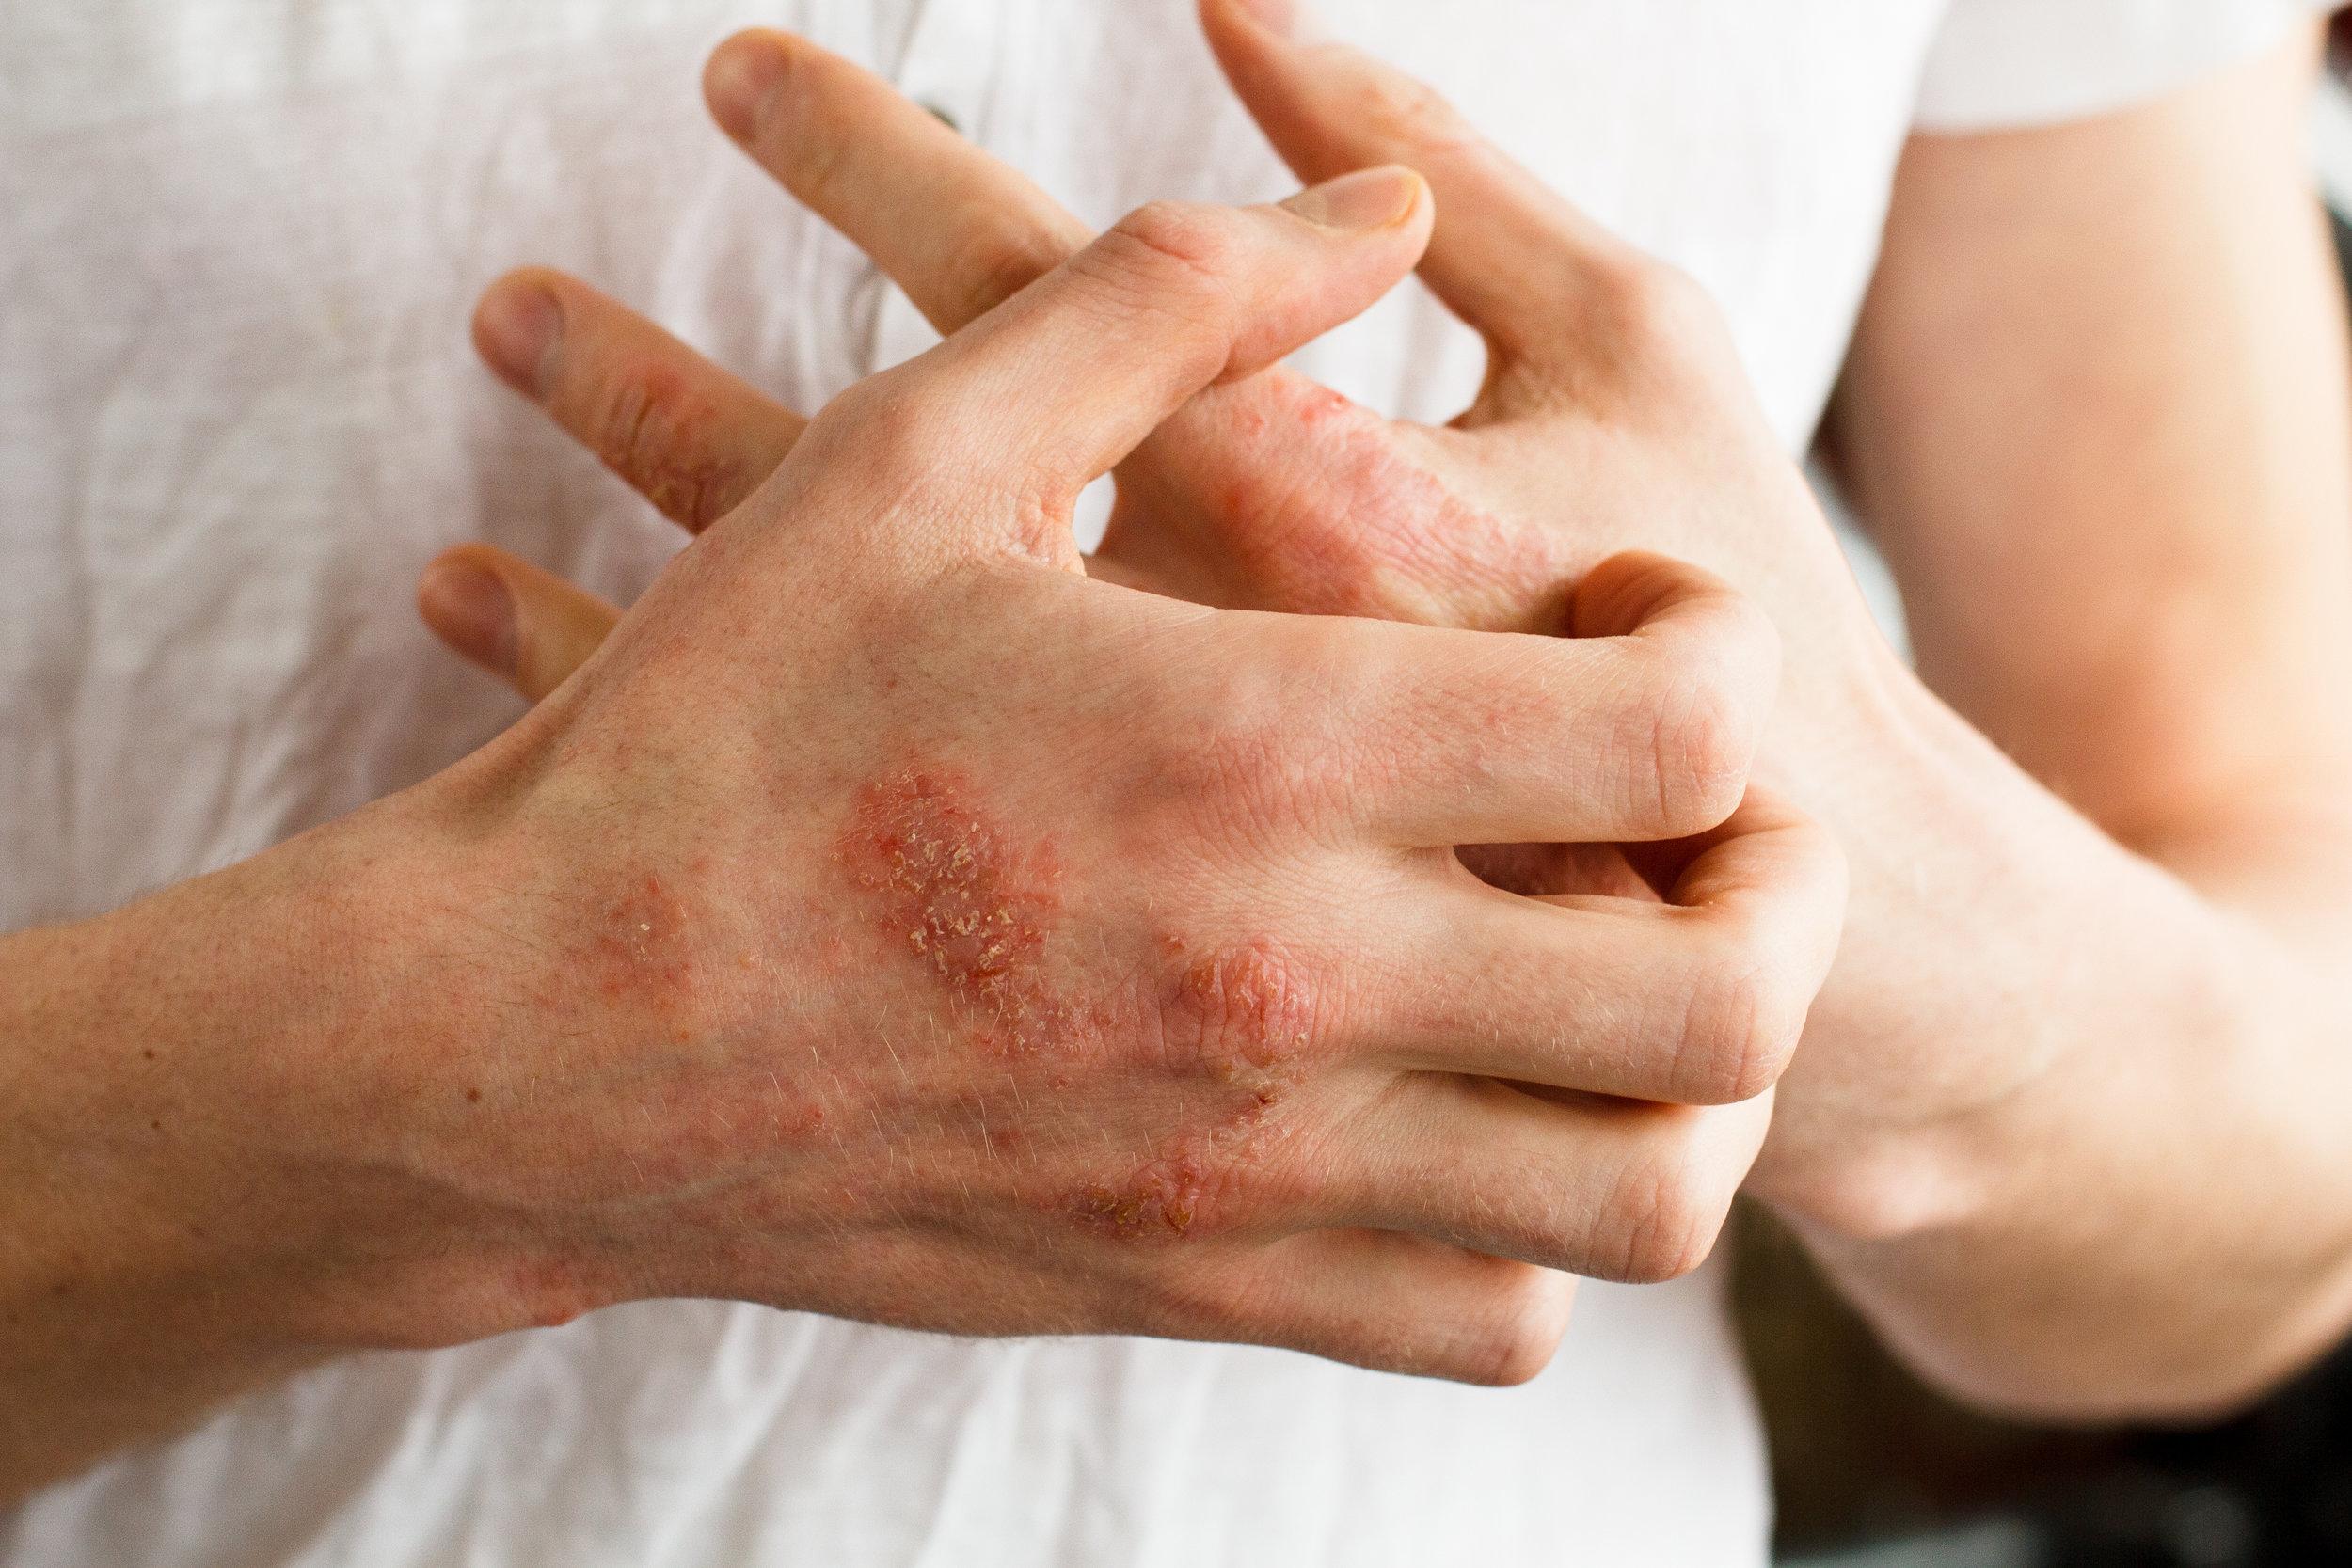 atopic dermatitis, what is atopic dermatitis, what causes atopic dermatitis, atopic dermatitis symptoms, eczema, tampa dermatologist, dermatologist in tampa, dermatitis tampa, dermatitis treatment, academic alliance in dermatology